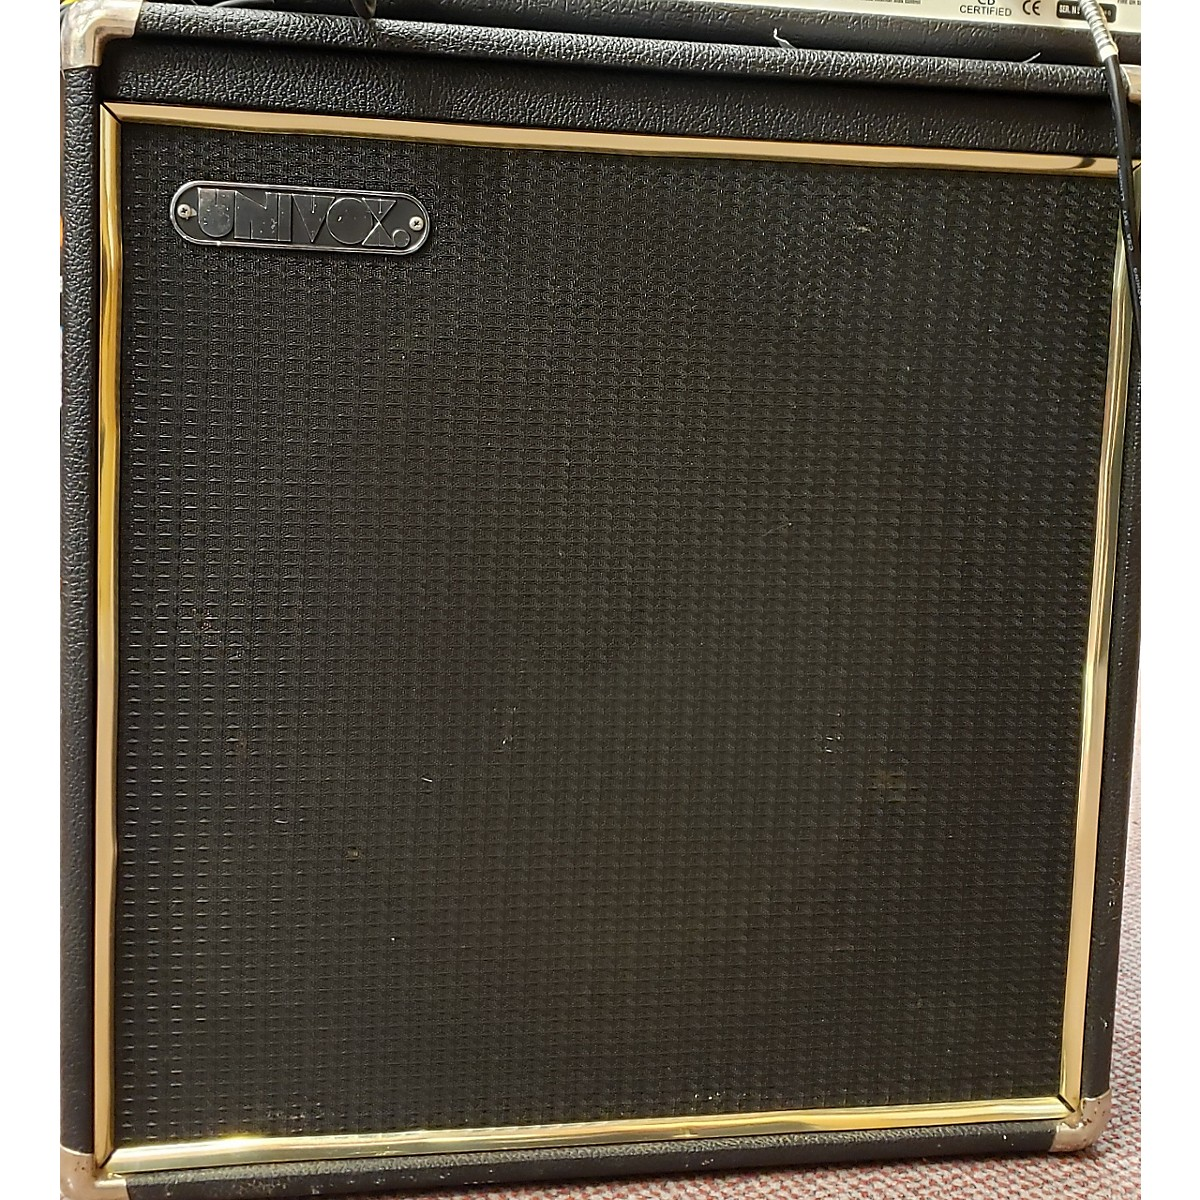 Univox 1970s Model U4100 Bass Combo Amp